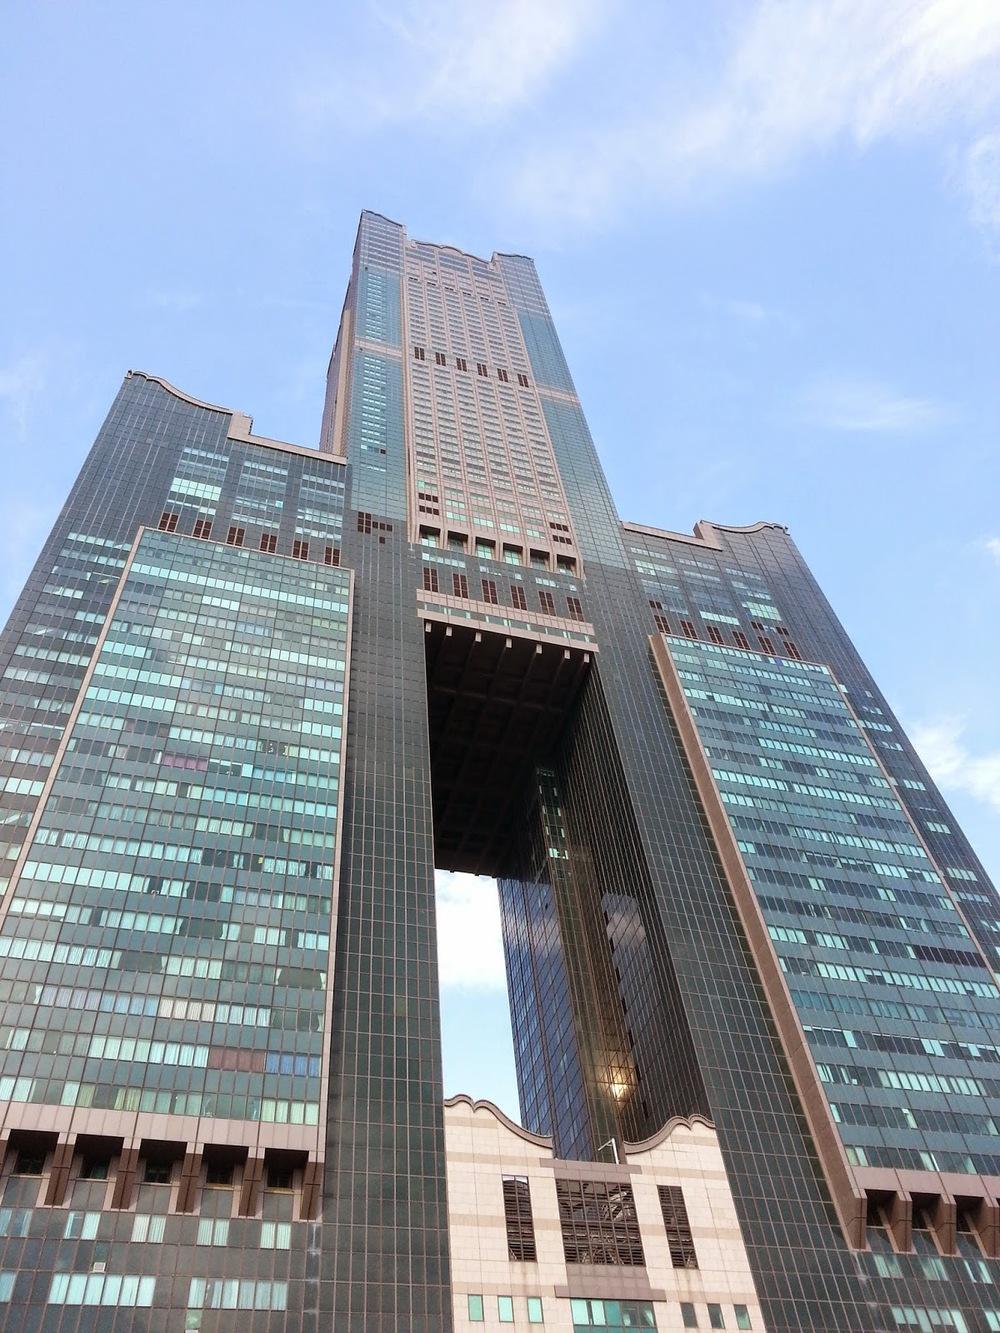 Taiwan%2BSky%2BTower%2BTravel%2BKaohsiung.jpg